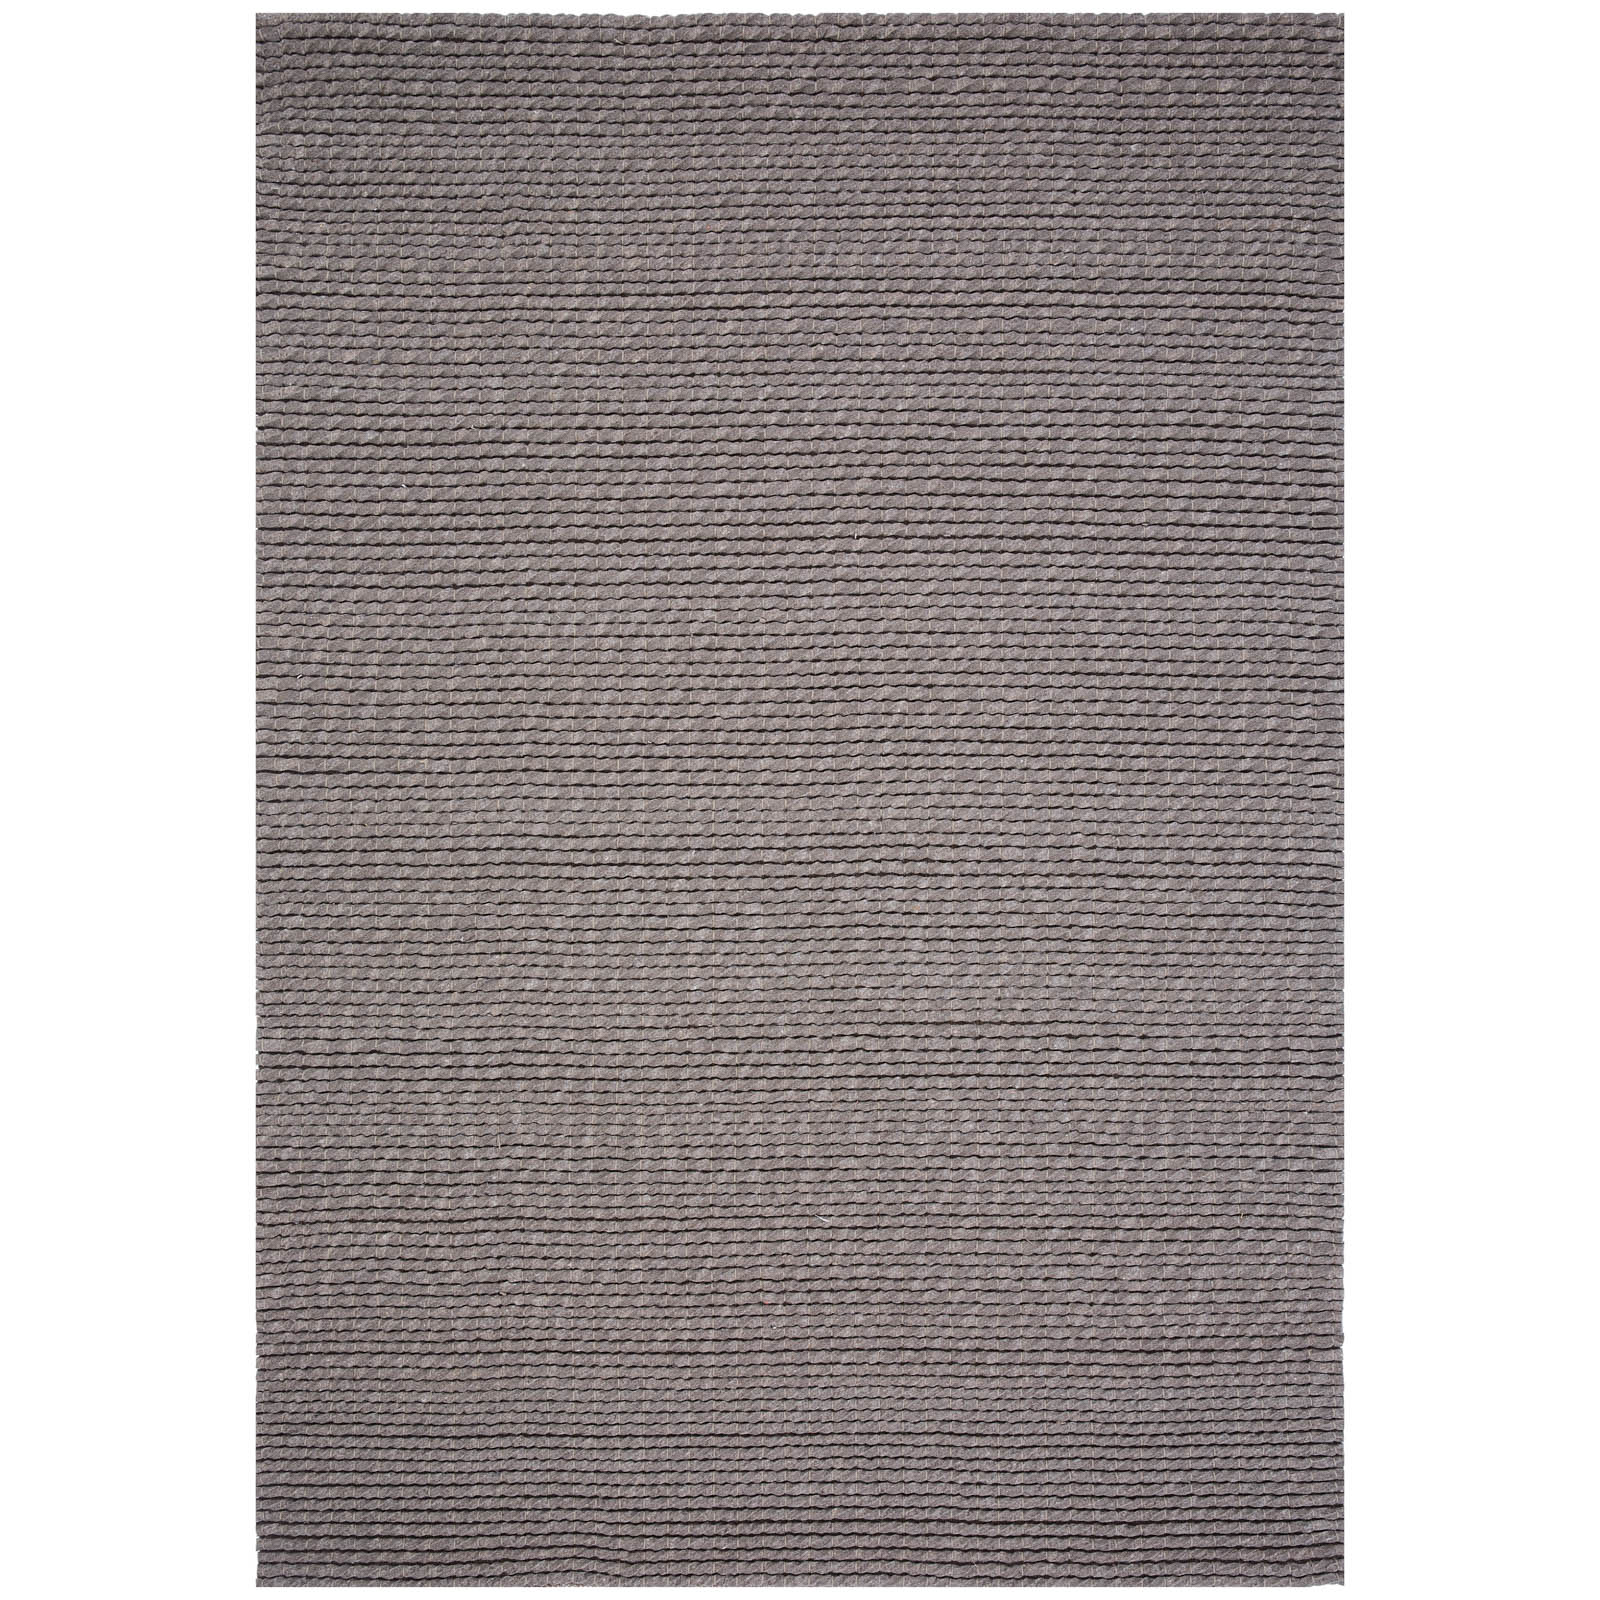 uni dream rugs    in beige by ligne pure  free uk  - uni dream rugs    in beige by ligne pure